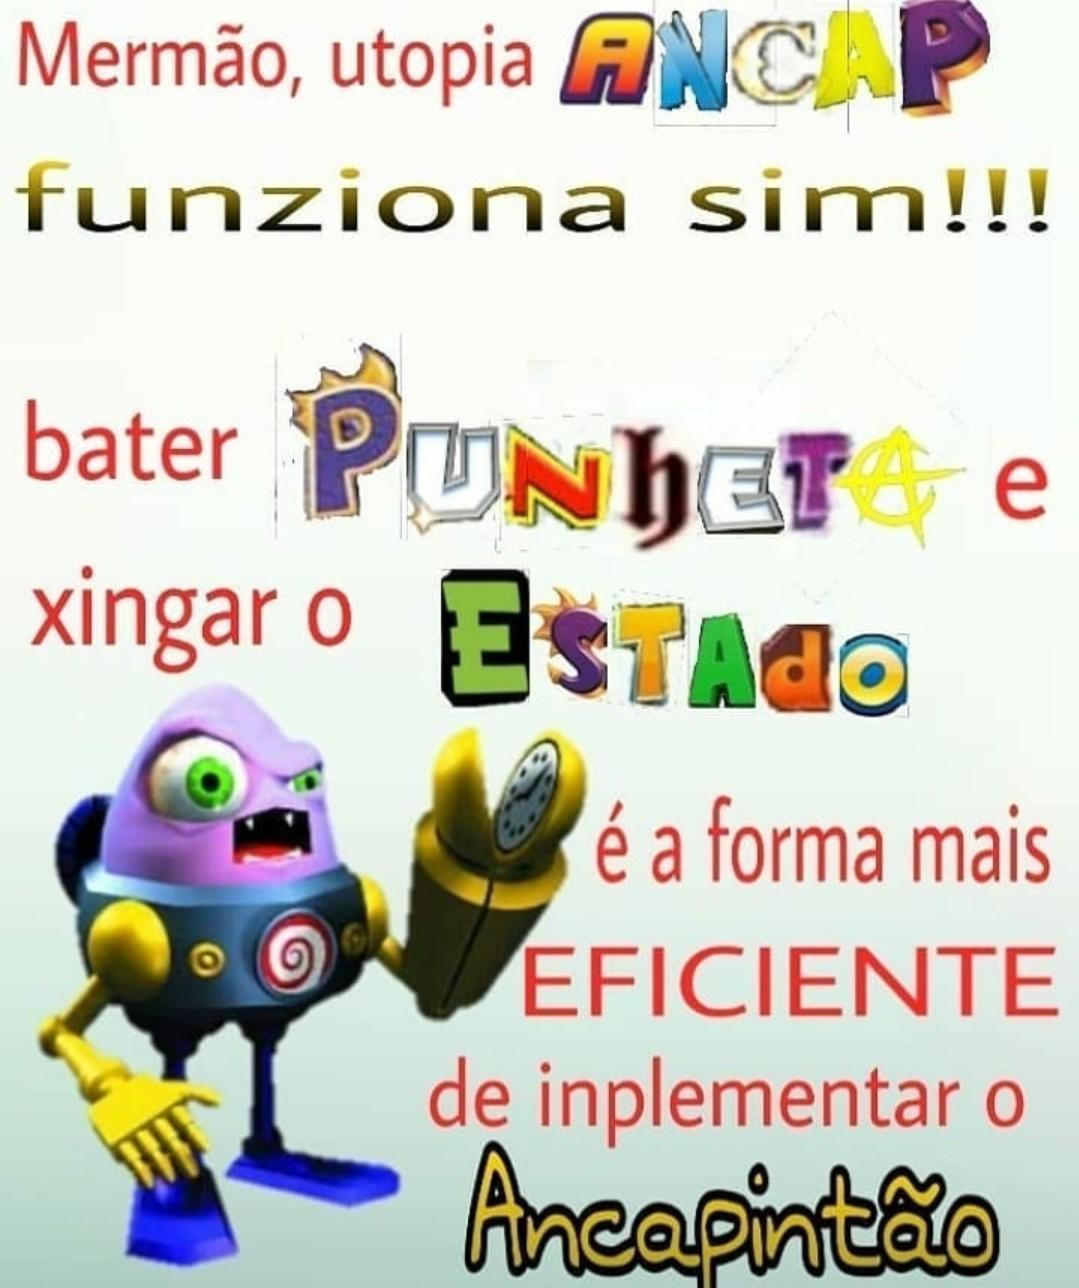 Buzeta - meme